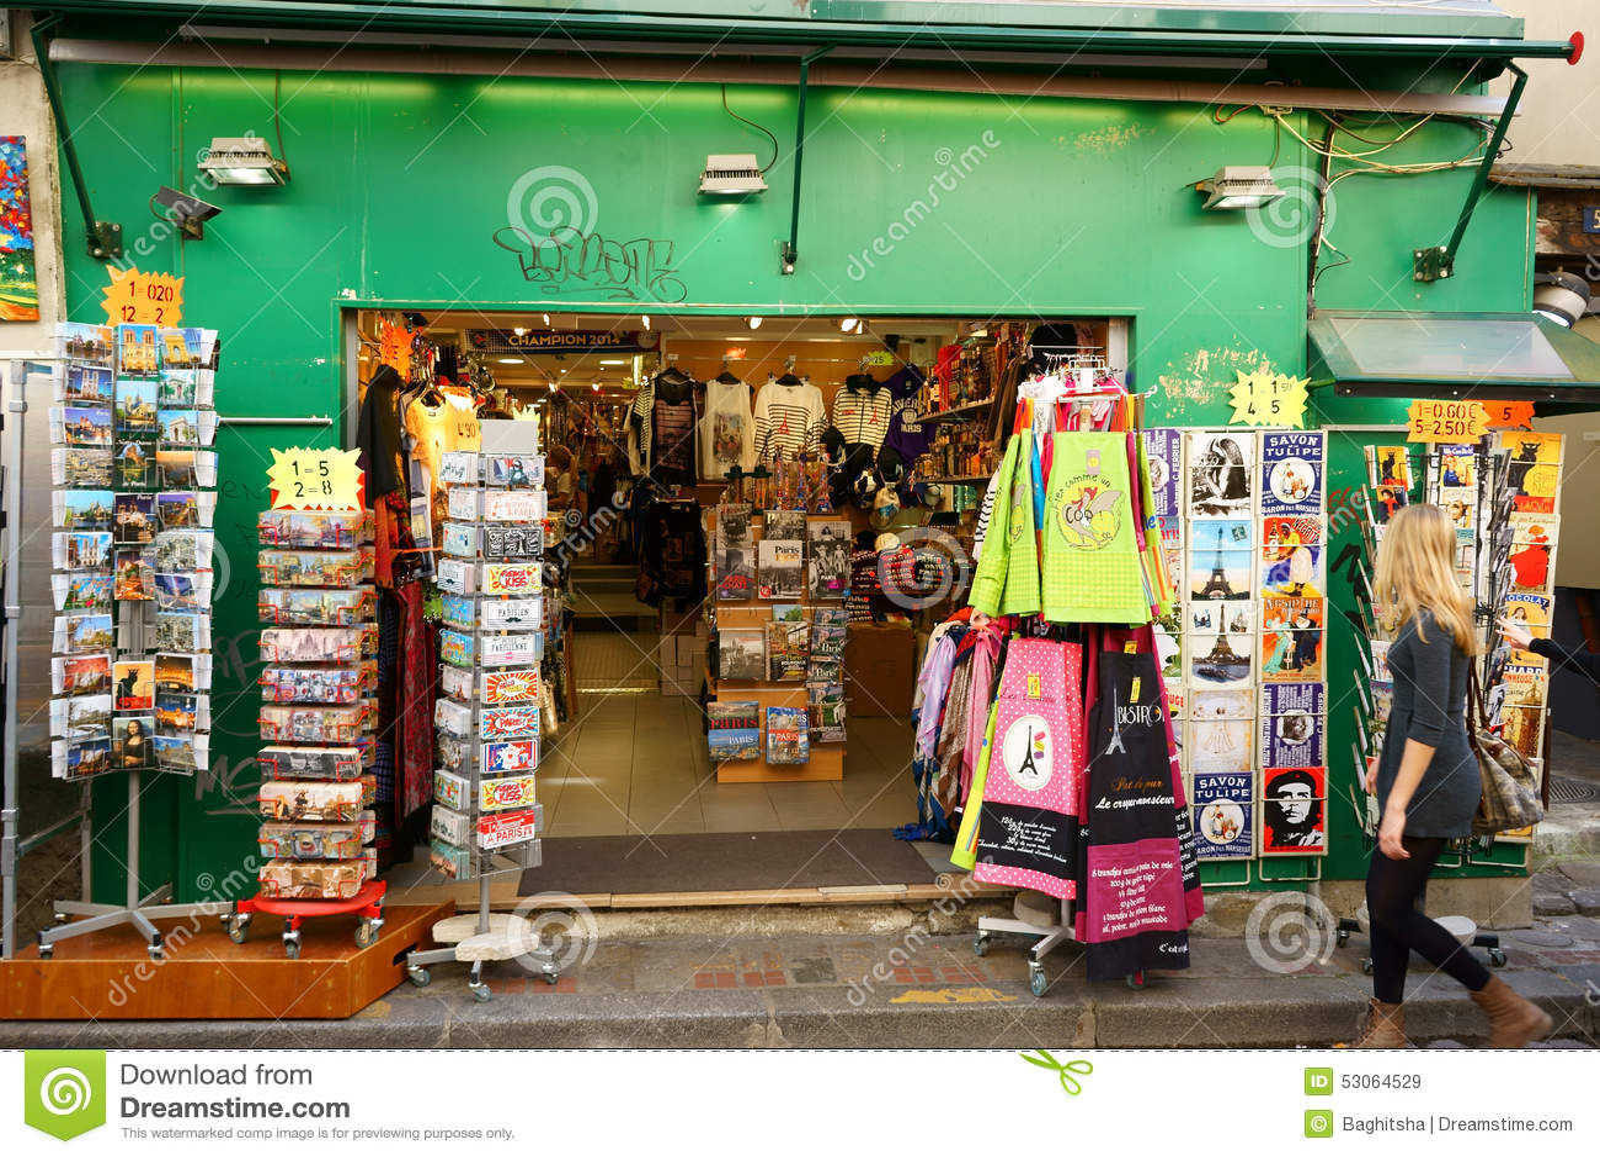 souvenir boutique in montmartre editorial stock image image 53064529. Black Bedroom Furniture Sets. Home Design Ideas